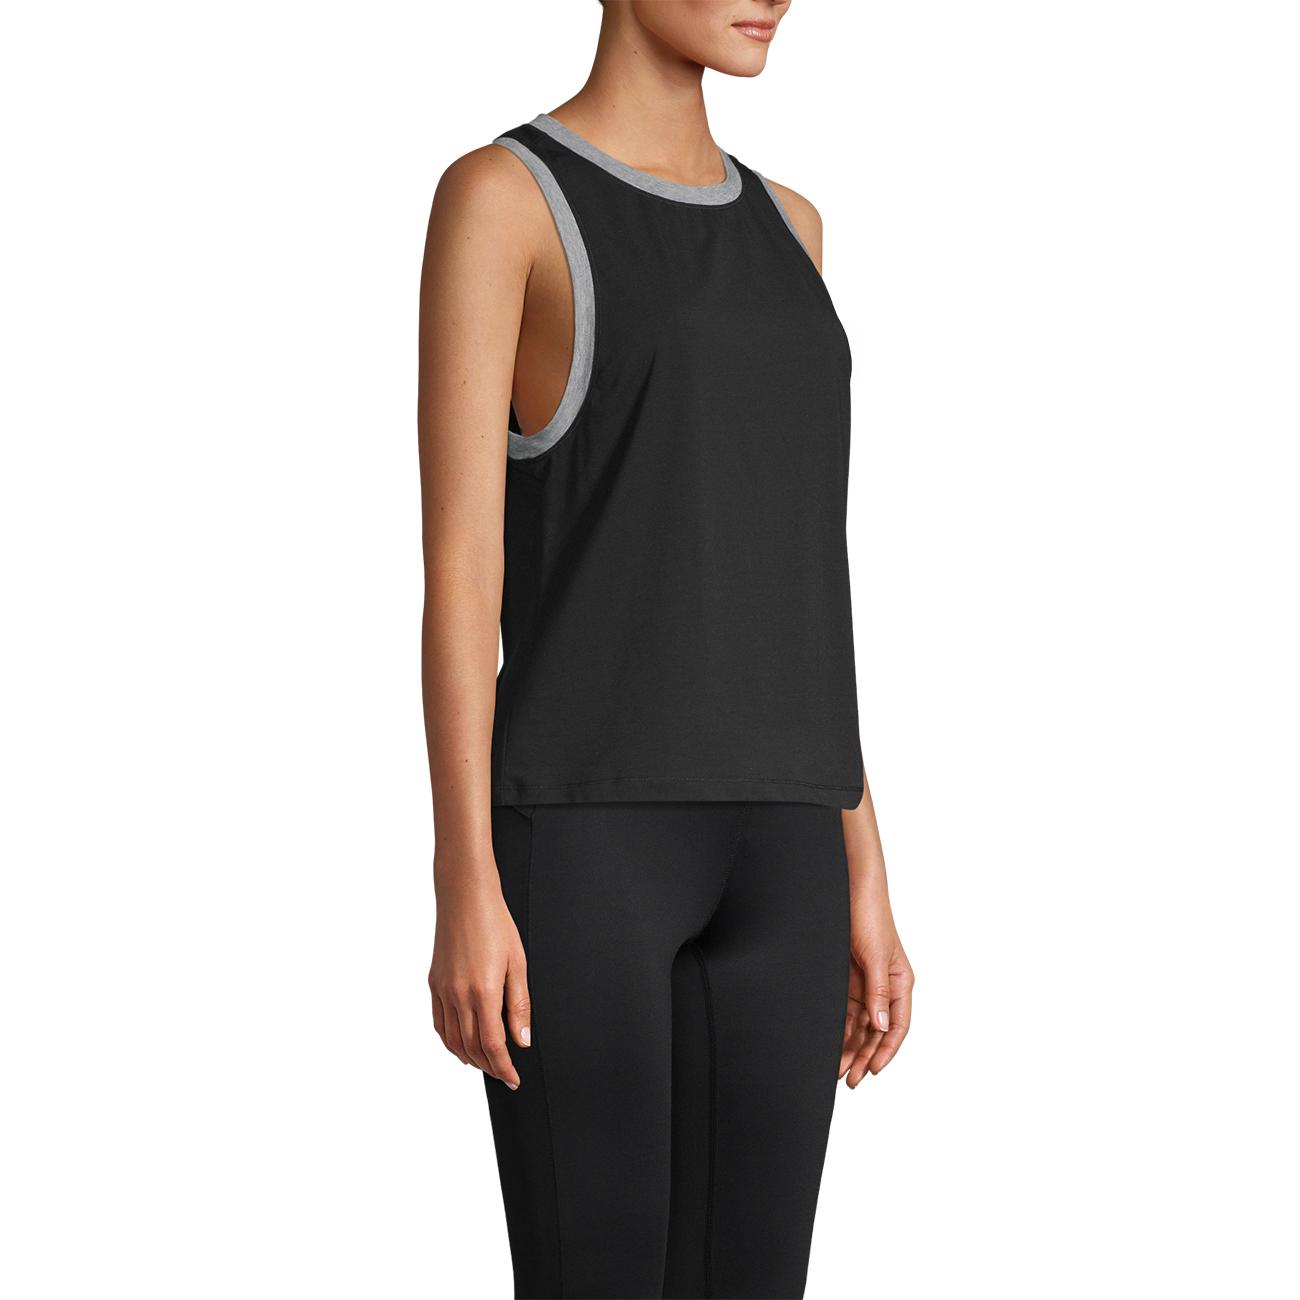 Shirts Tank Free By And Yoga Flex Tops Casall Black w44B05q